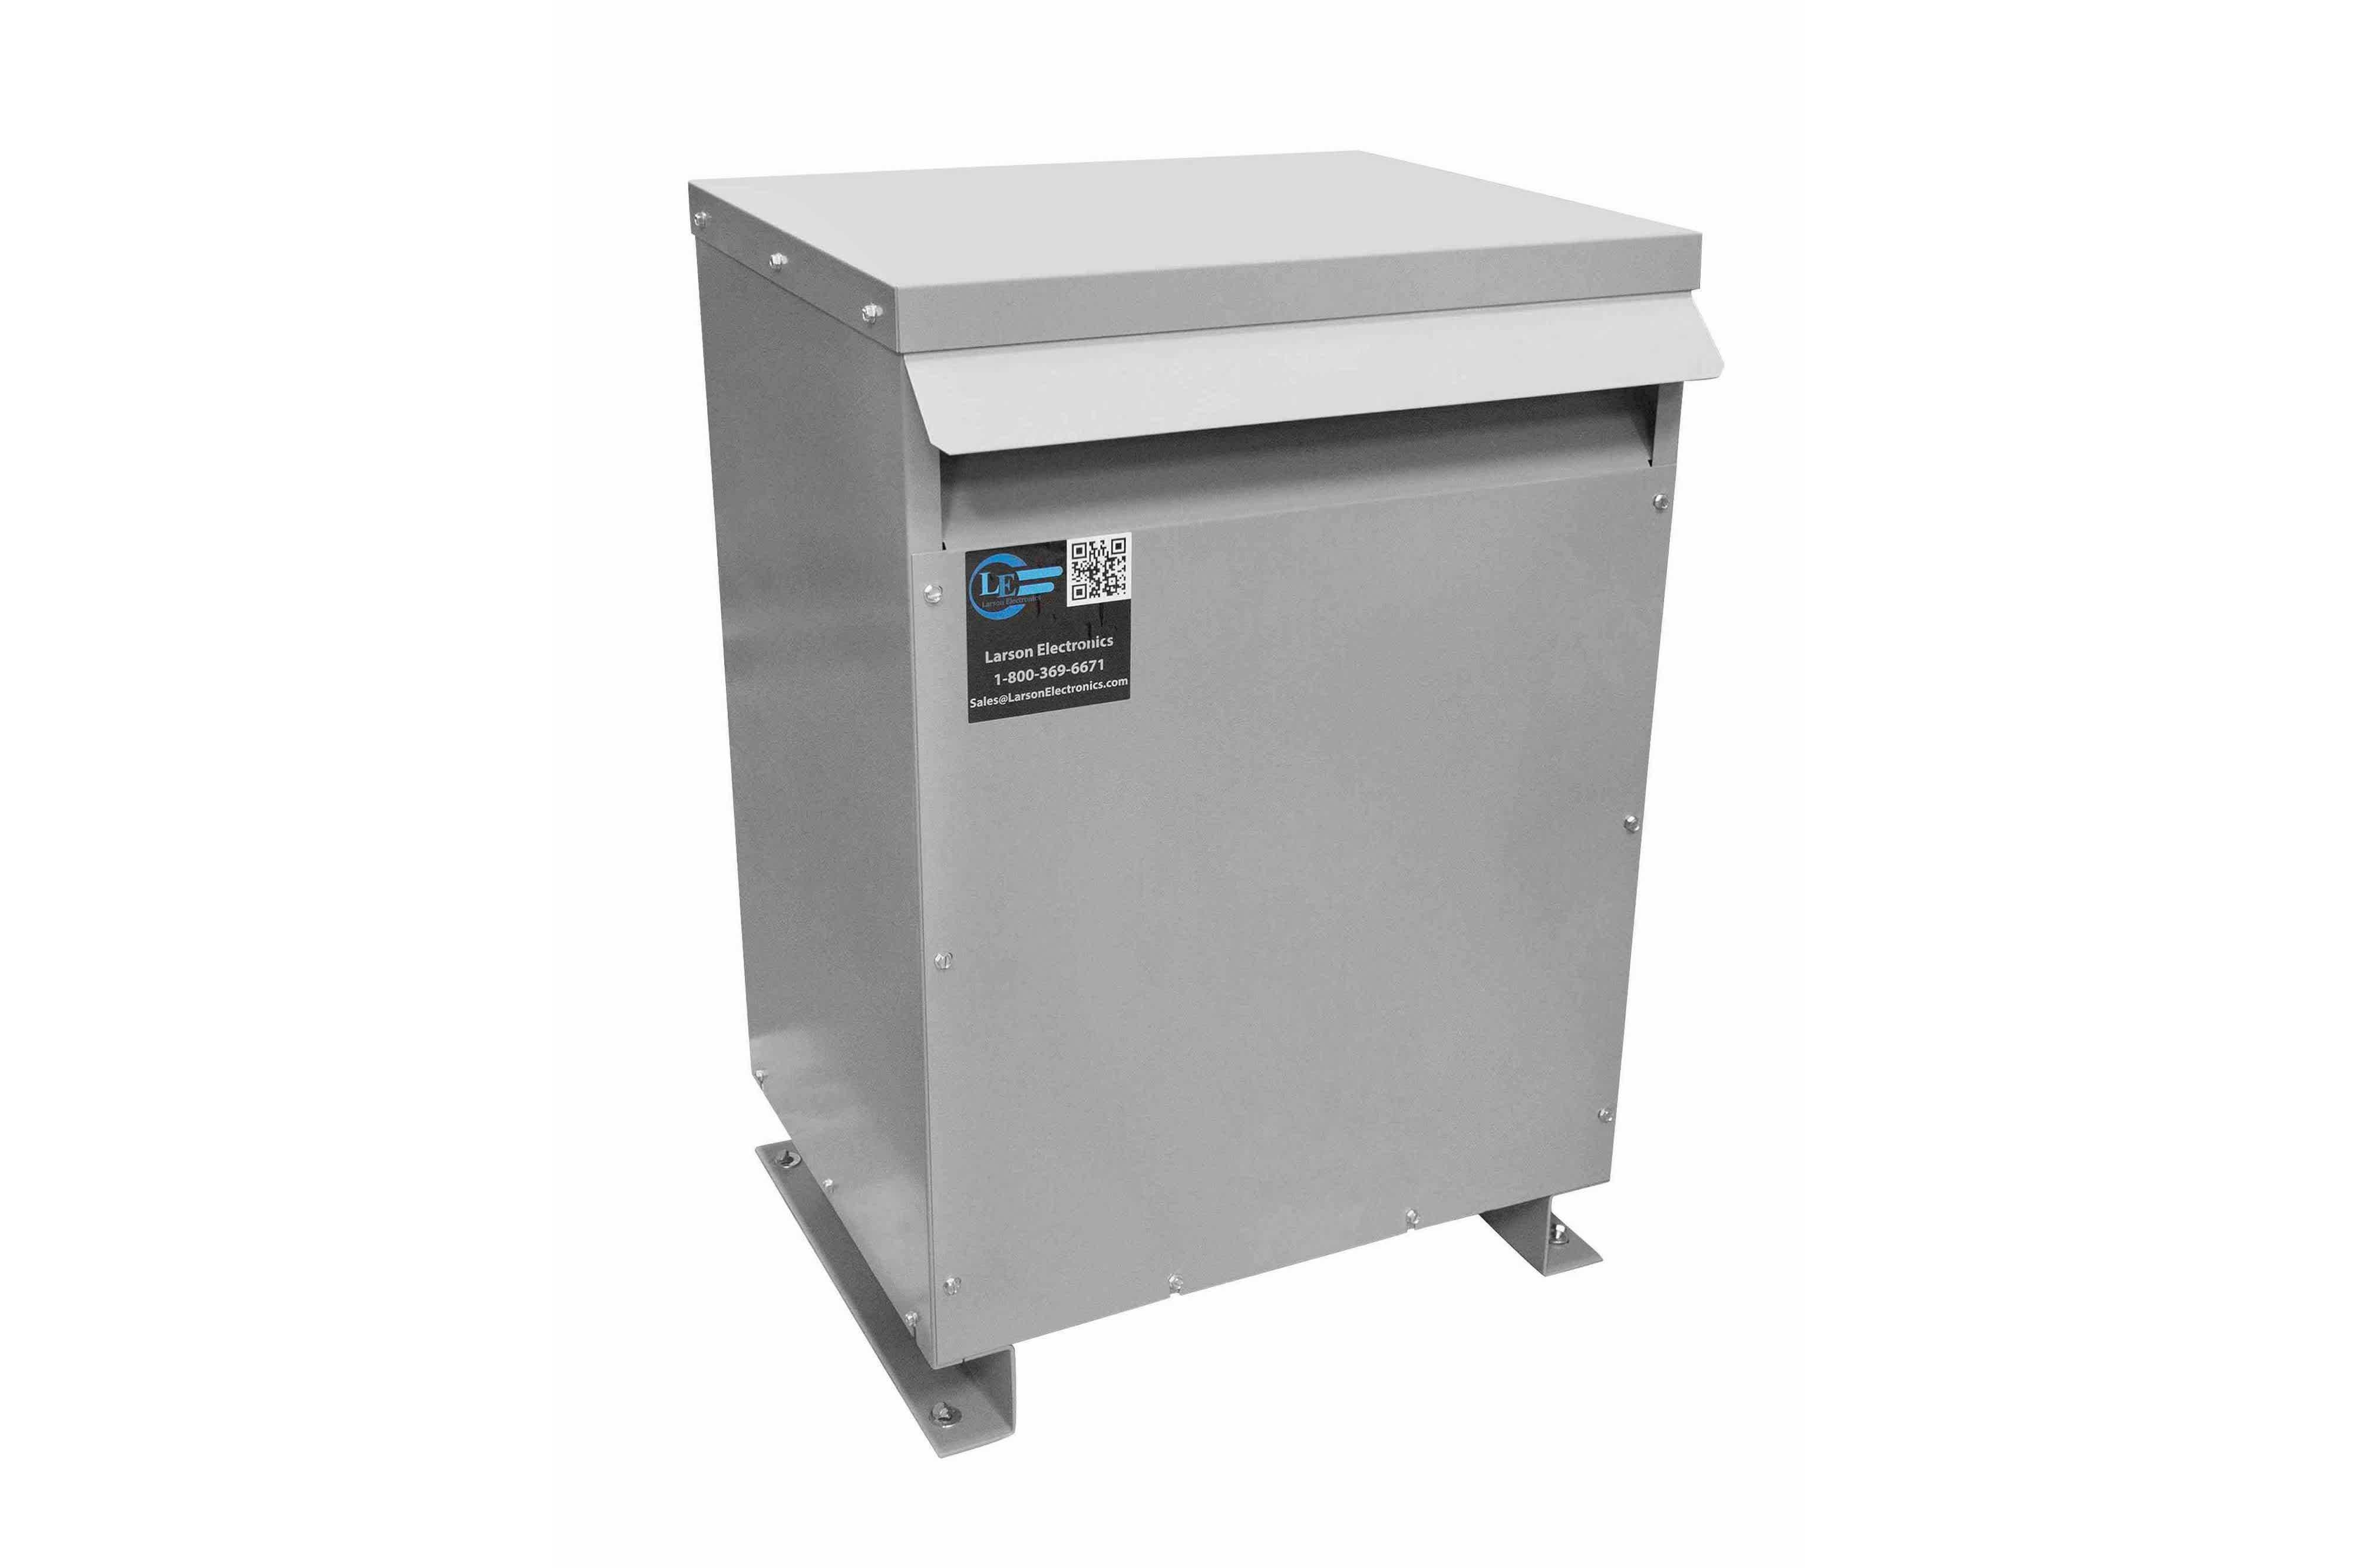 37.5 kVA 3PH DOE Transformer, 240V Delta Primary, 415Y/240 Wye-N Secondary, N3R, Ventilated, 60 Hz